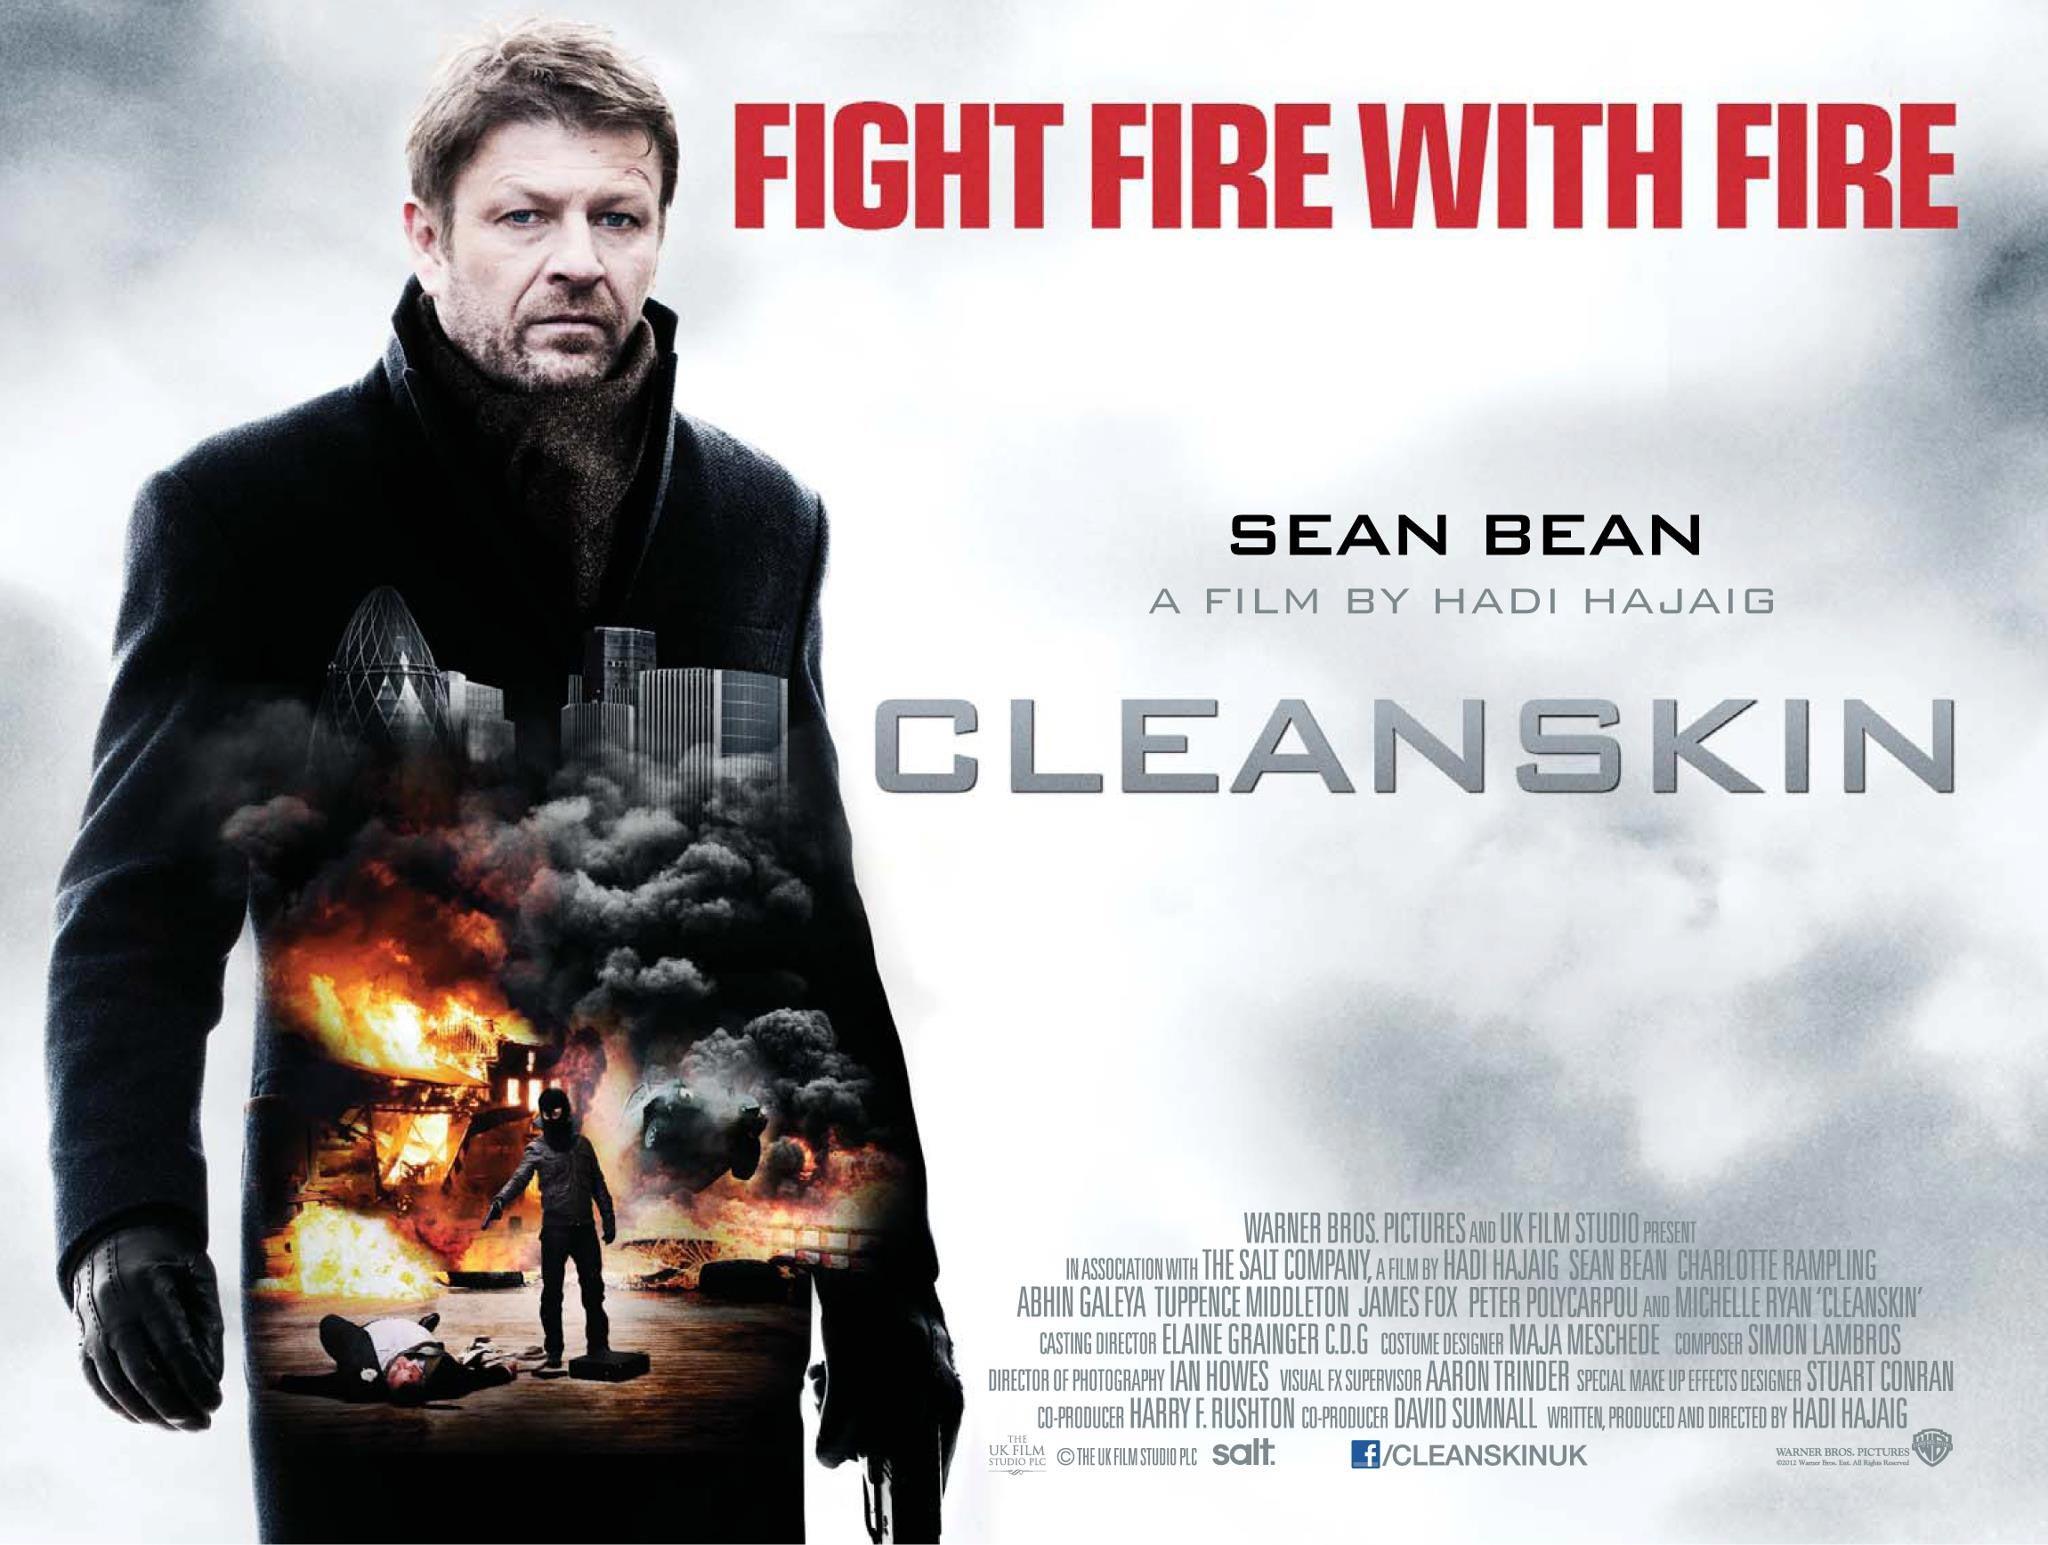 https://i2.wp.com/www.filmofilia.com/wp-content/uploads/2012/03/cleanskin_quad.jpg